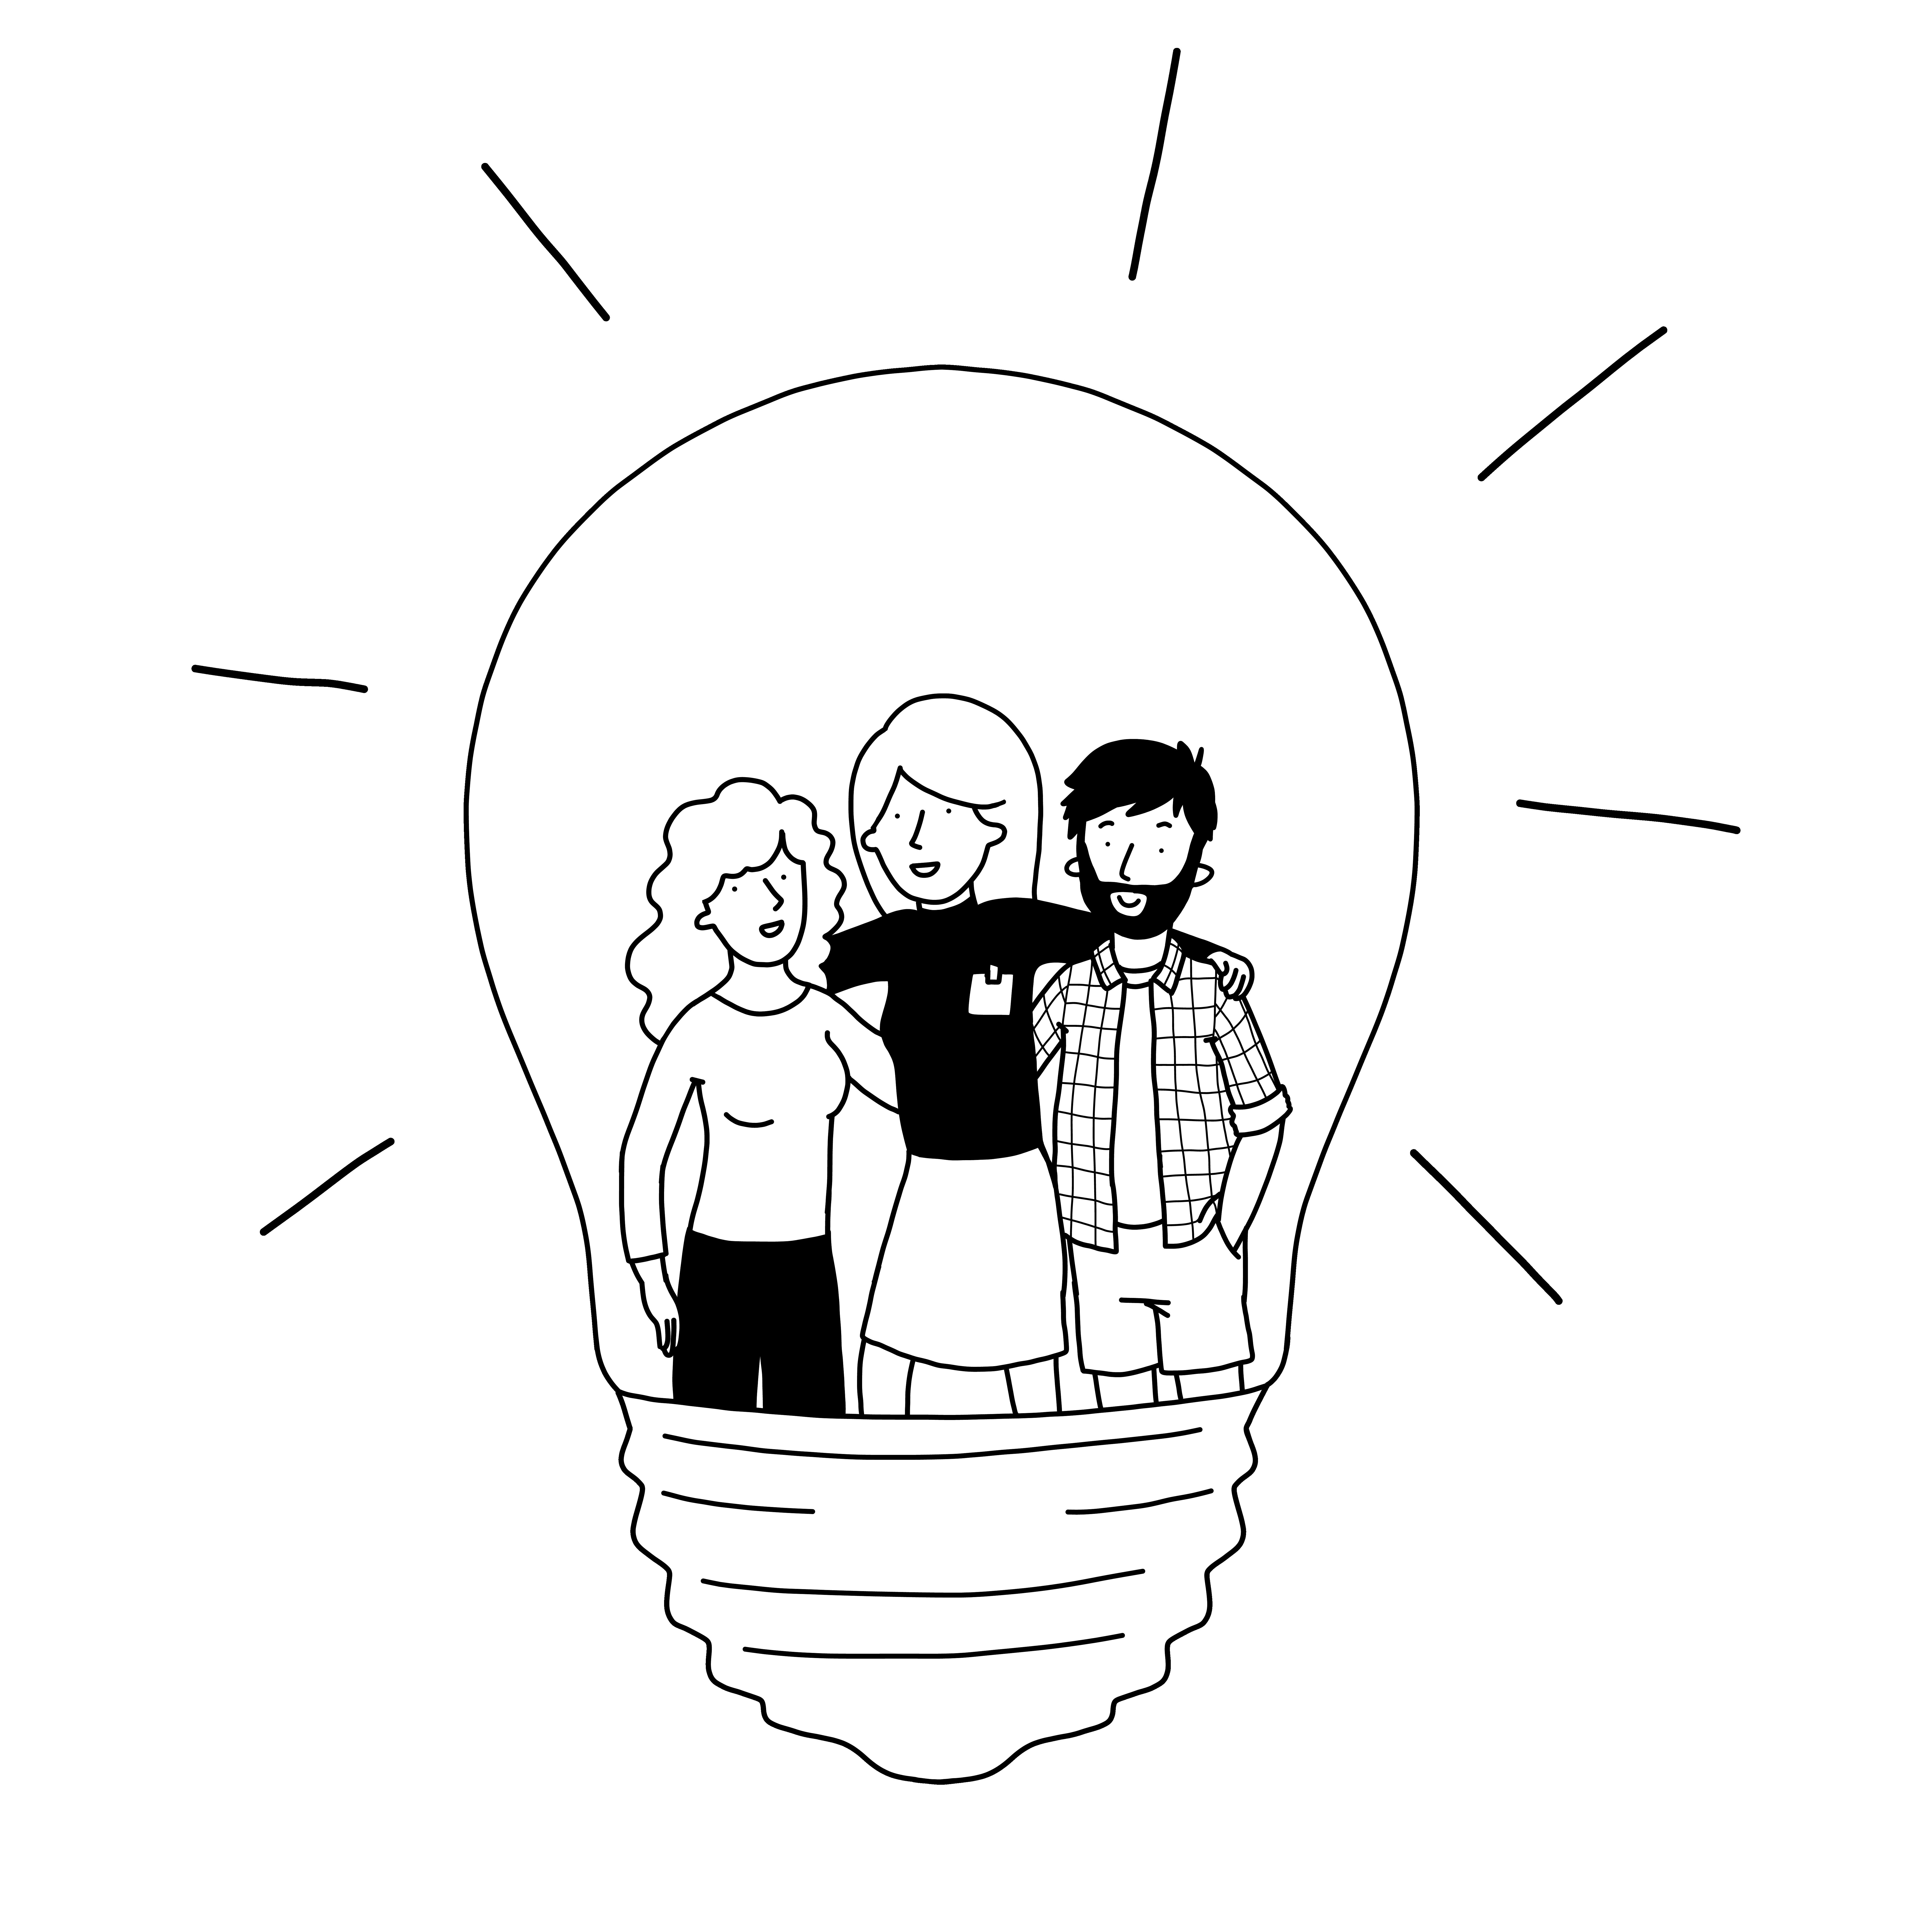 Riesenspatz Infoillustration (http://riesenspatz.de) für Wikimedia Deutschland, Illustration Mentoring, CC BY-SA 4.0 (https://creativecommons.org/licenses/by-sa/4.0/legalcode)